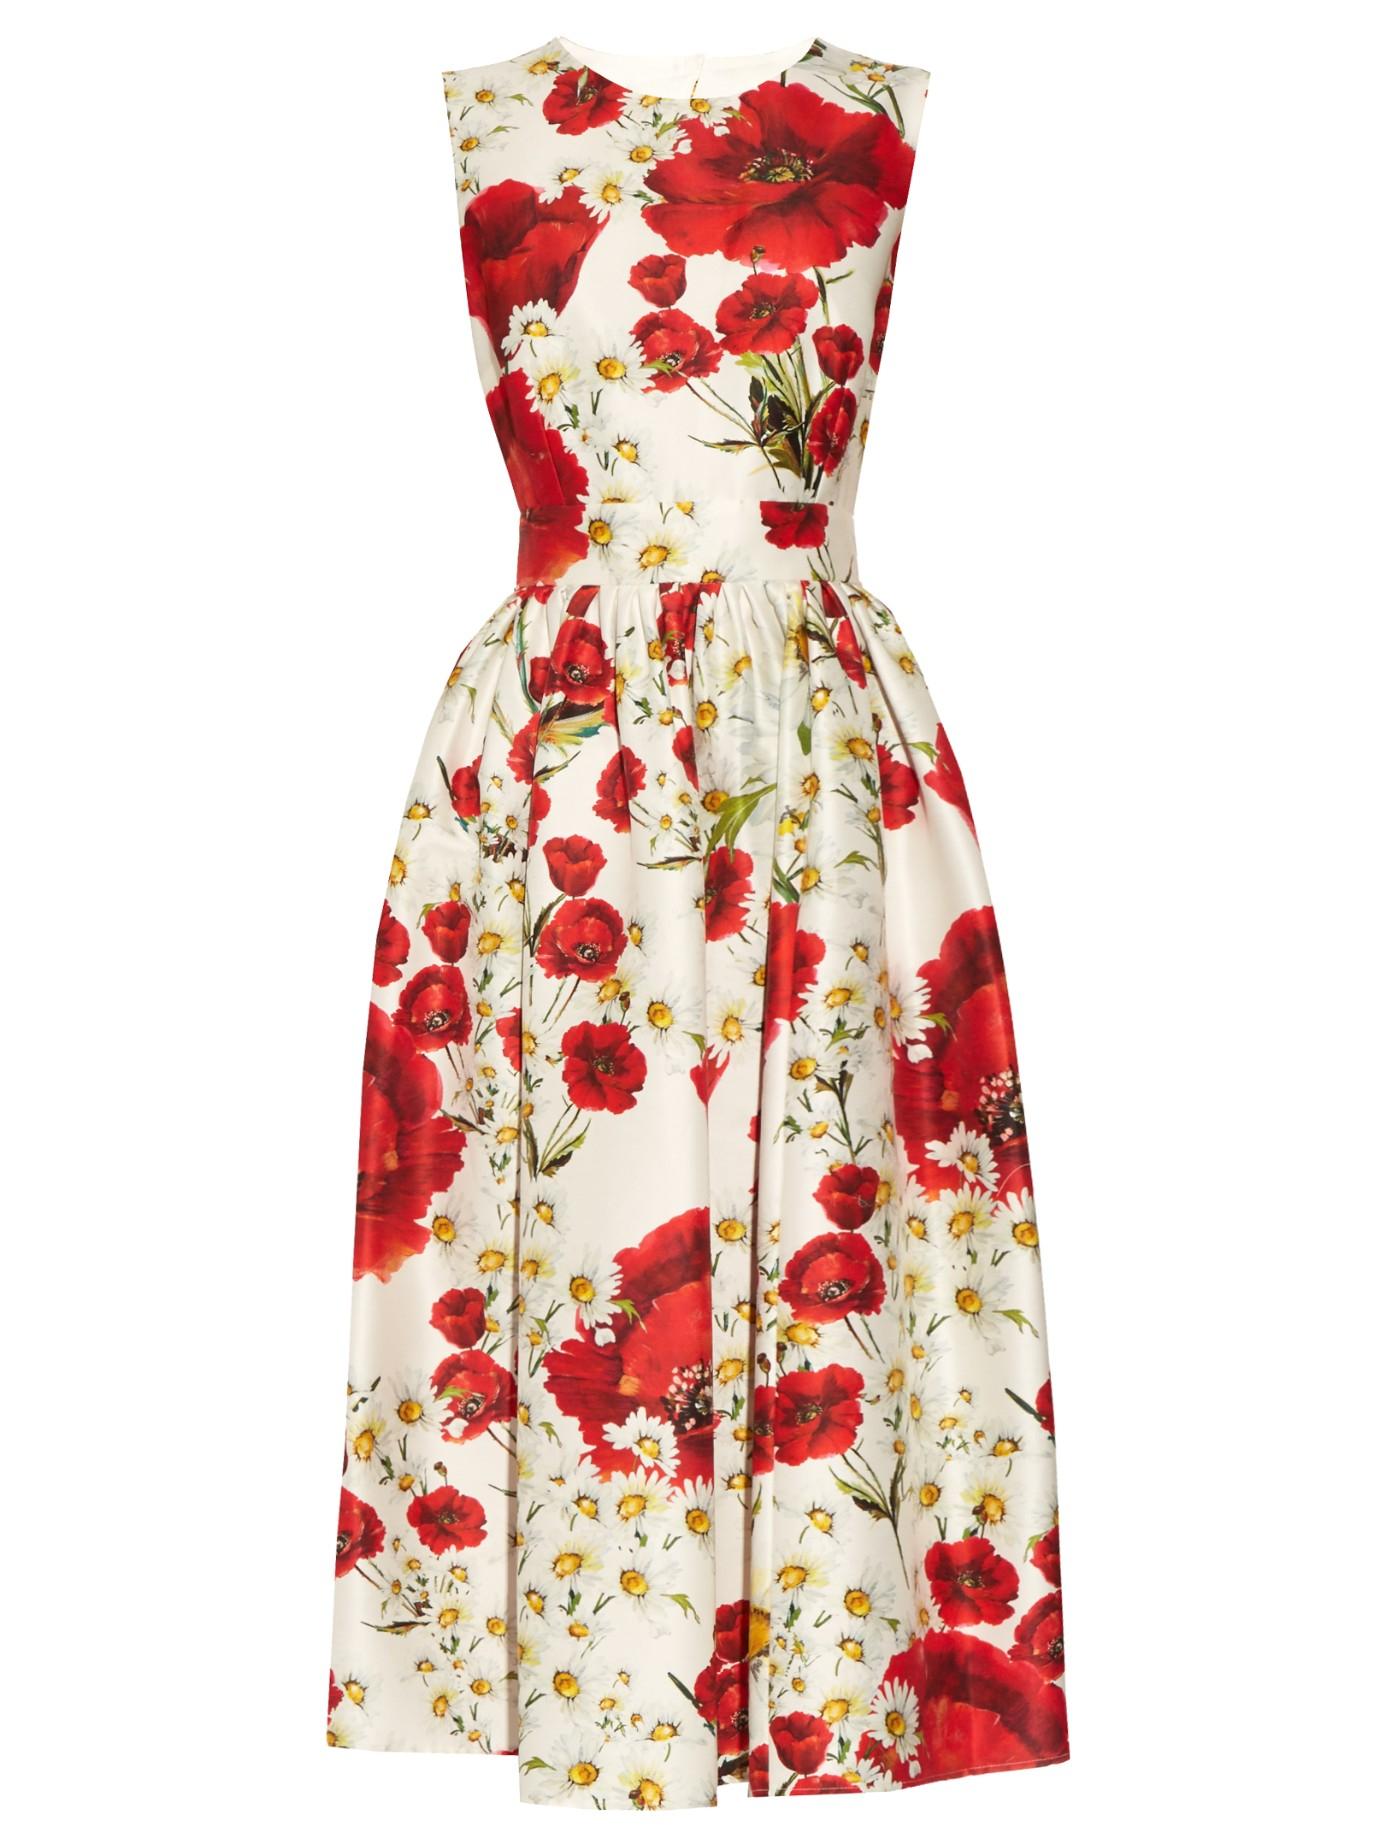 Dolce Amp Gabbana Poppy Print Cotton And Silk Blend Dress In